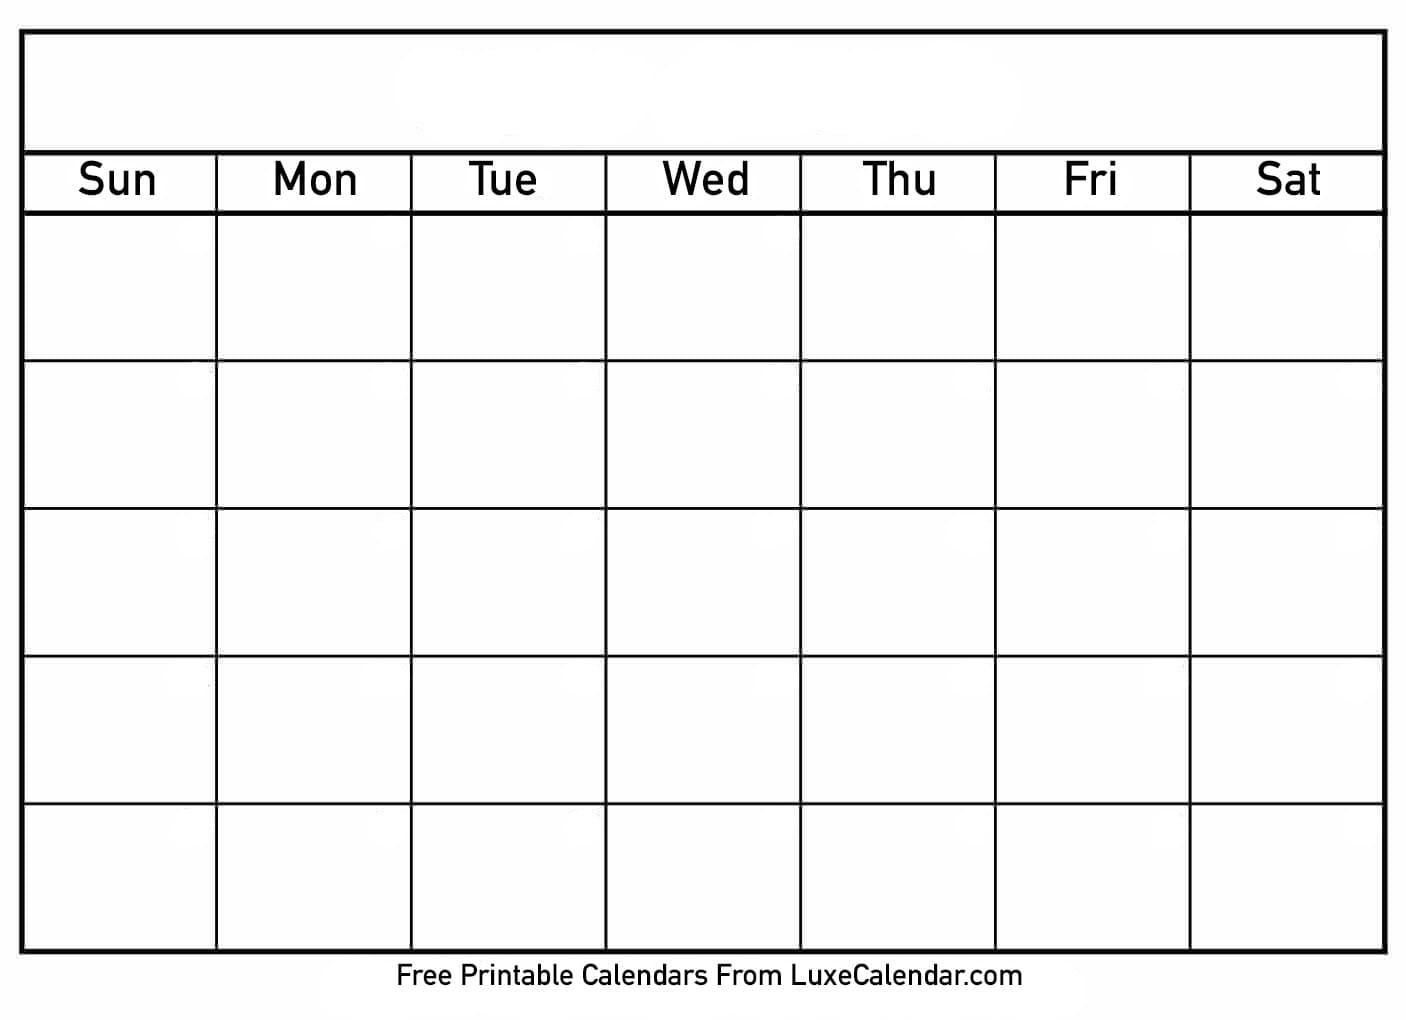 Printable Calendar Templates Full Page - Calendar